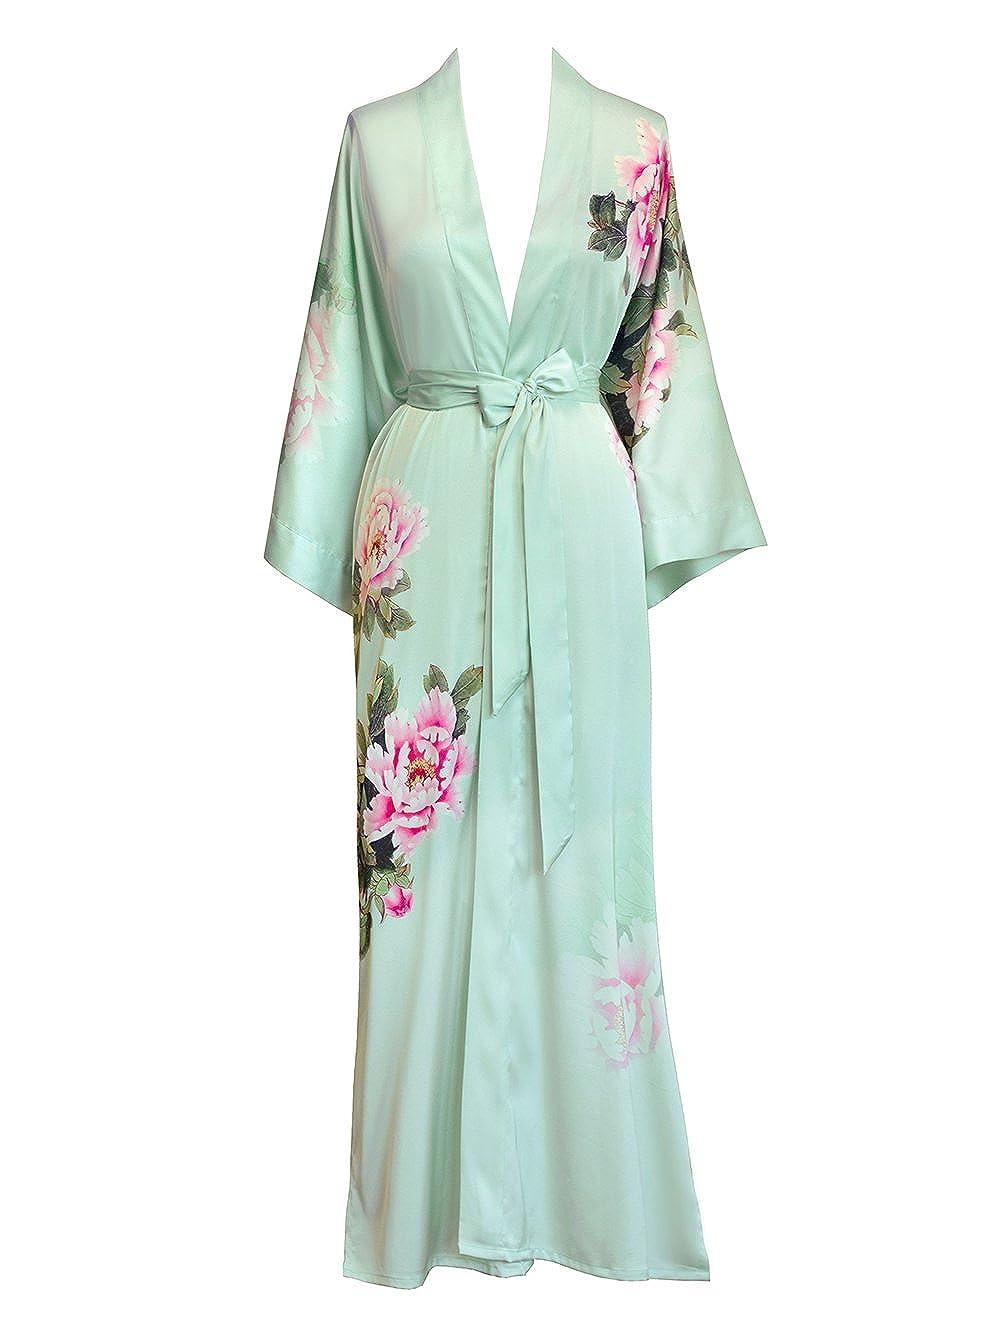 Peony & Bird Celedon Old Shanghai Women's Kimono Robe Long  Watercolor Floral